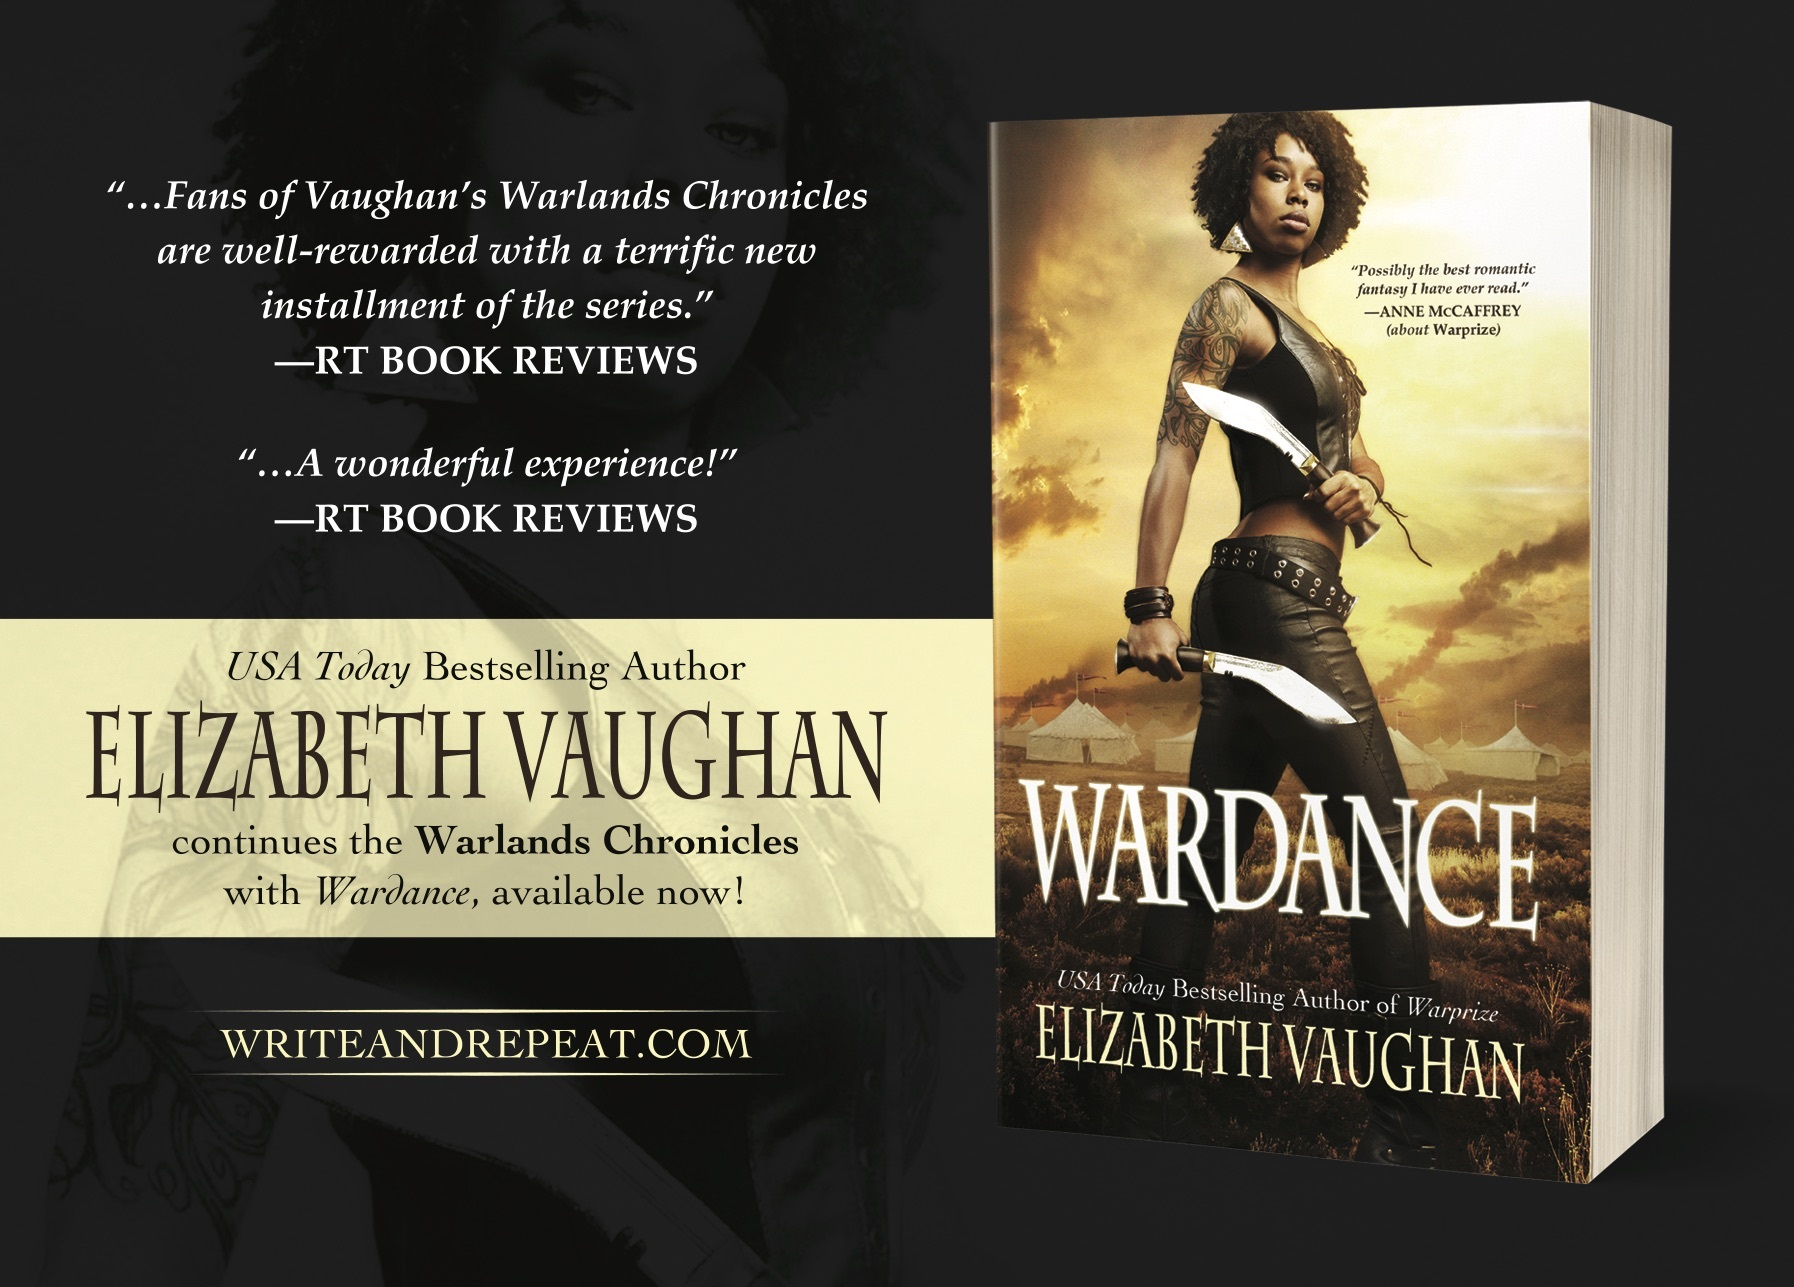 wardance.jpg